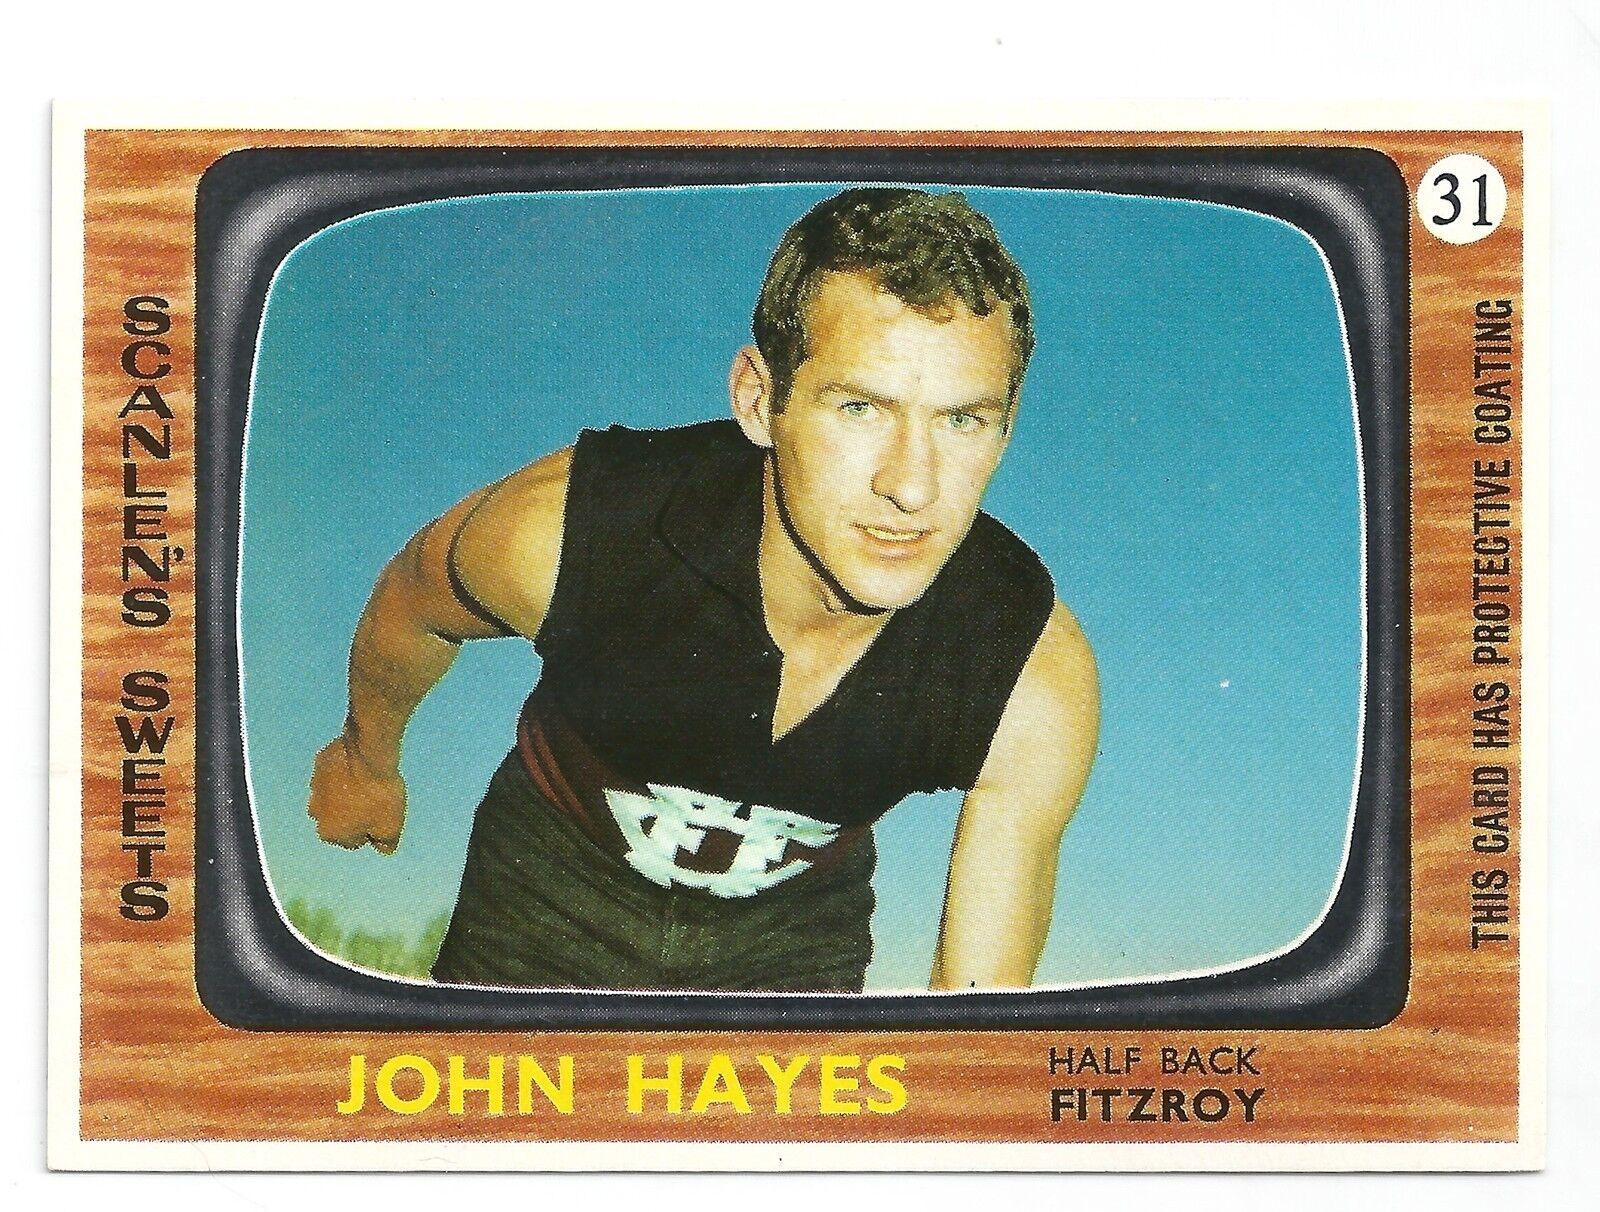 1967 Scanlens John HAYES Fitzroy Mint.